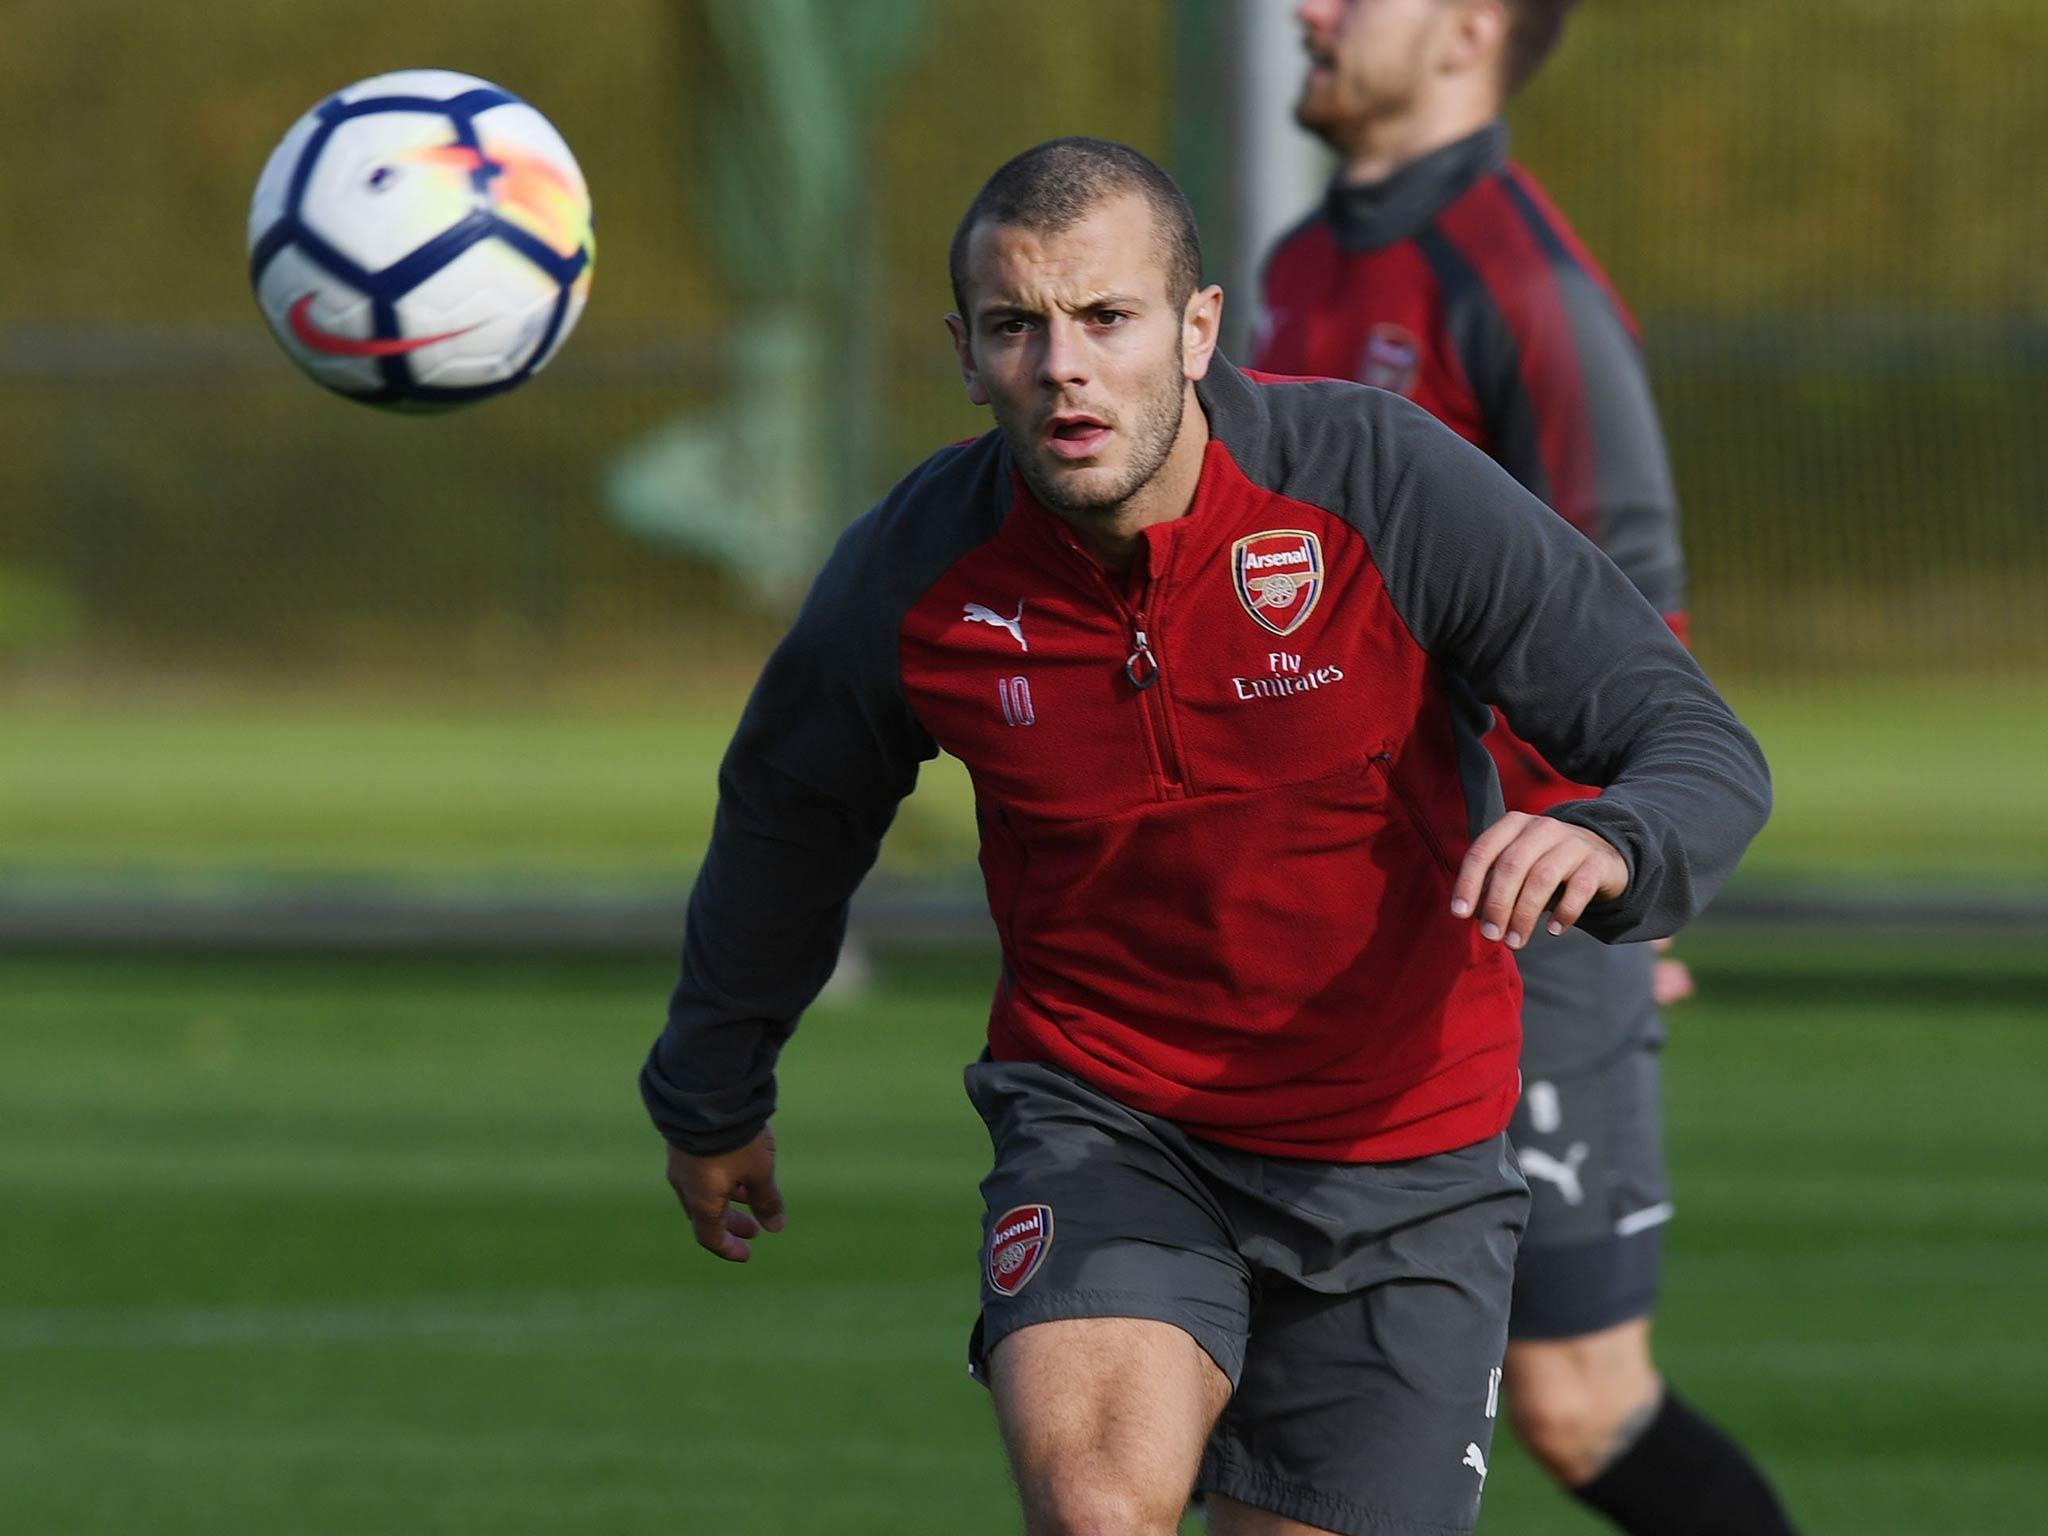 Arsenal midfielder Jack Wilshere reveals he started his coaching